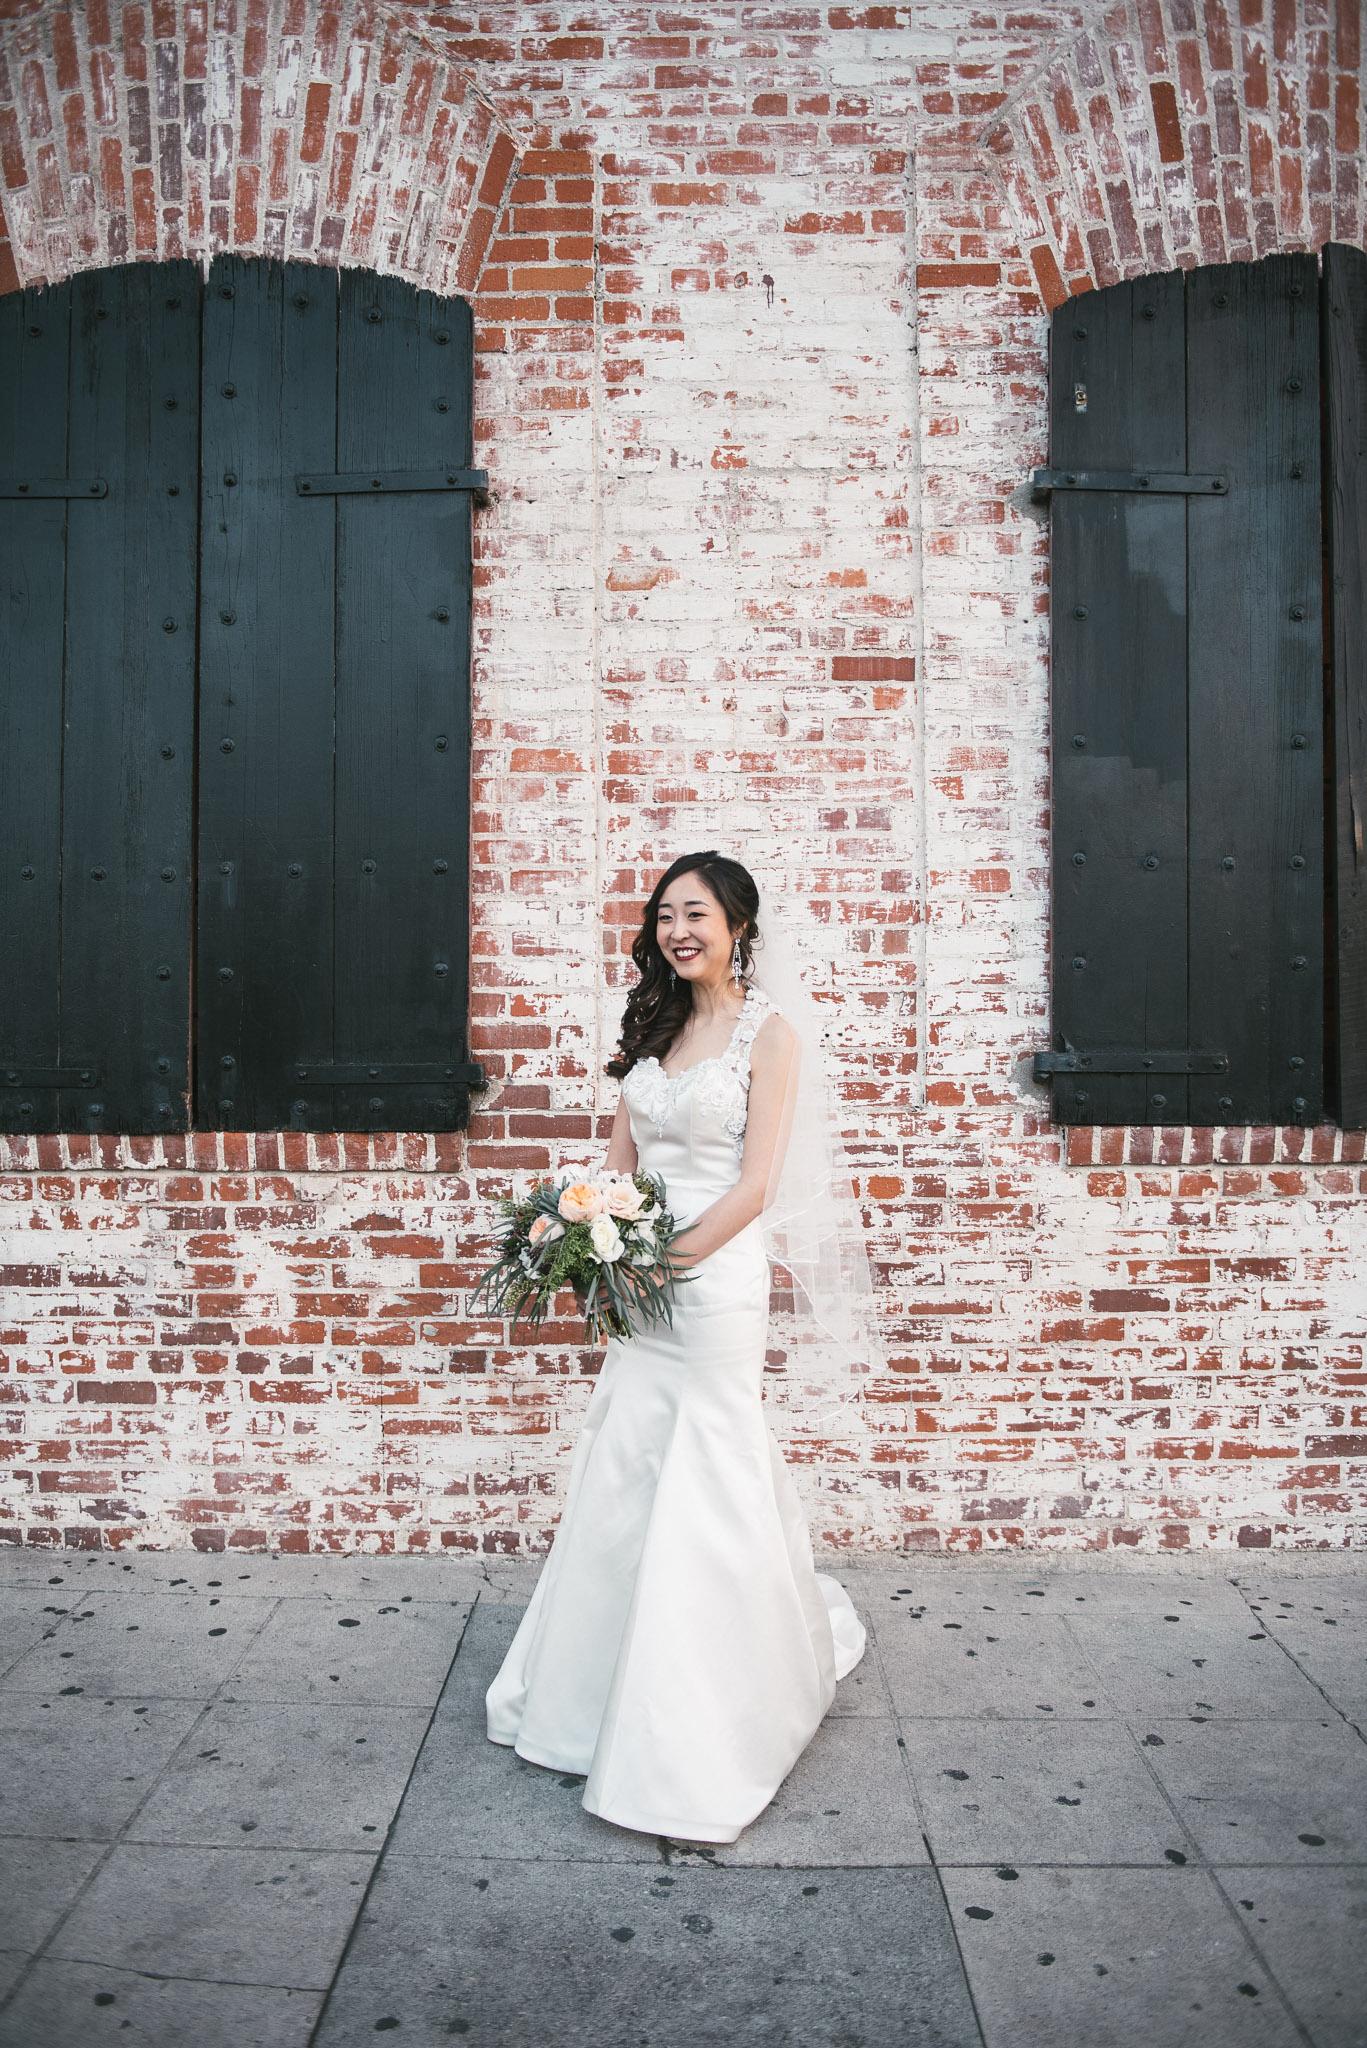 brian hana wedding154.jpg